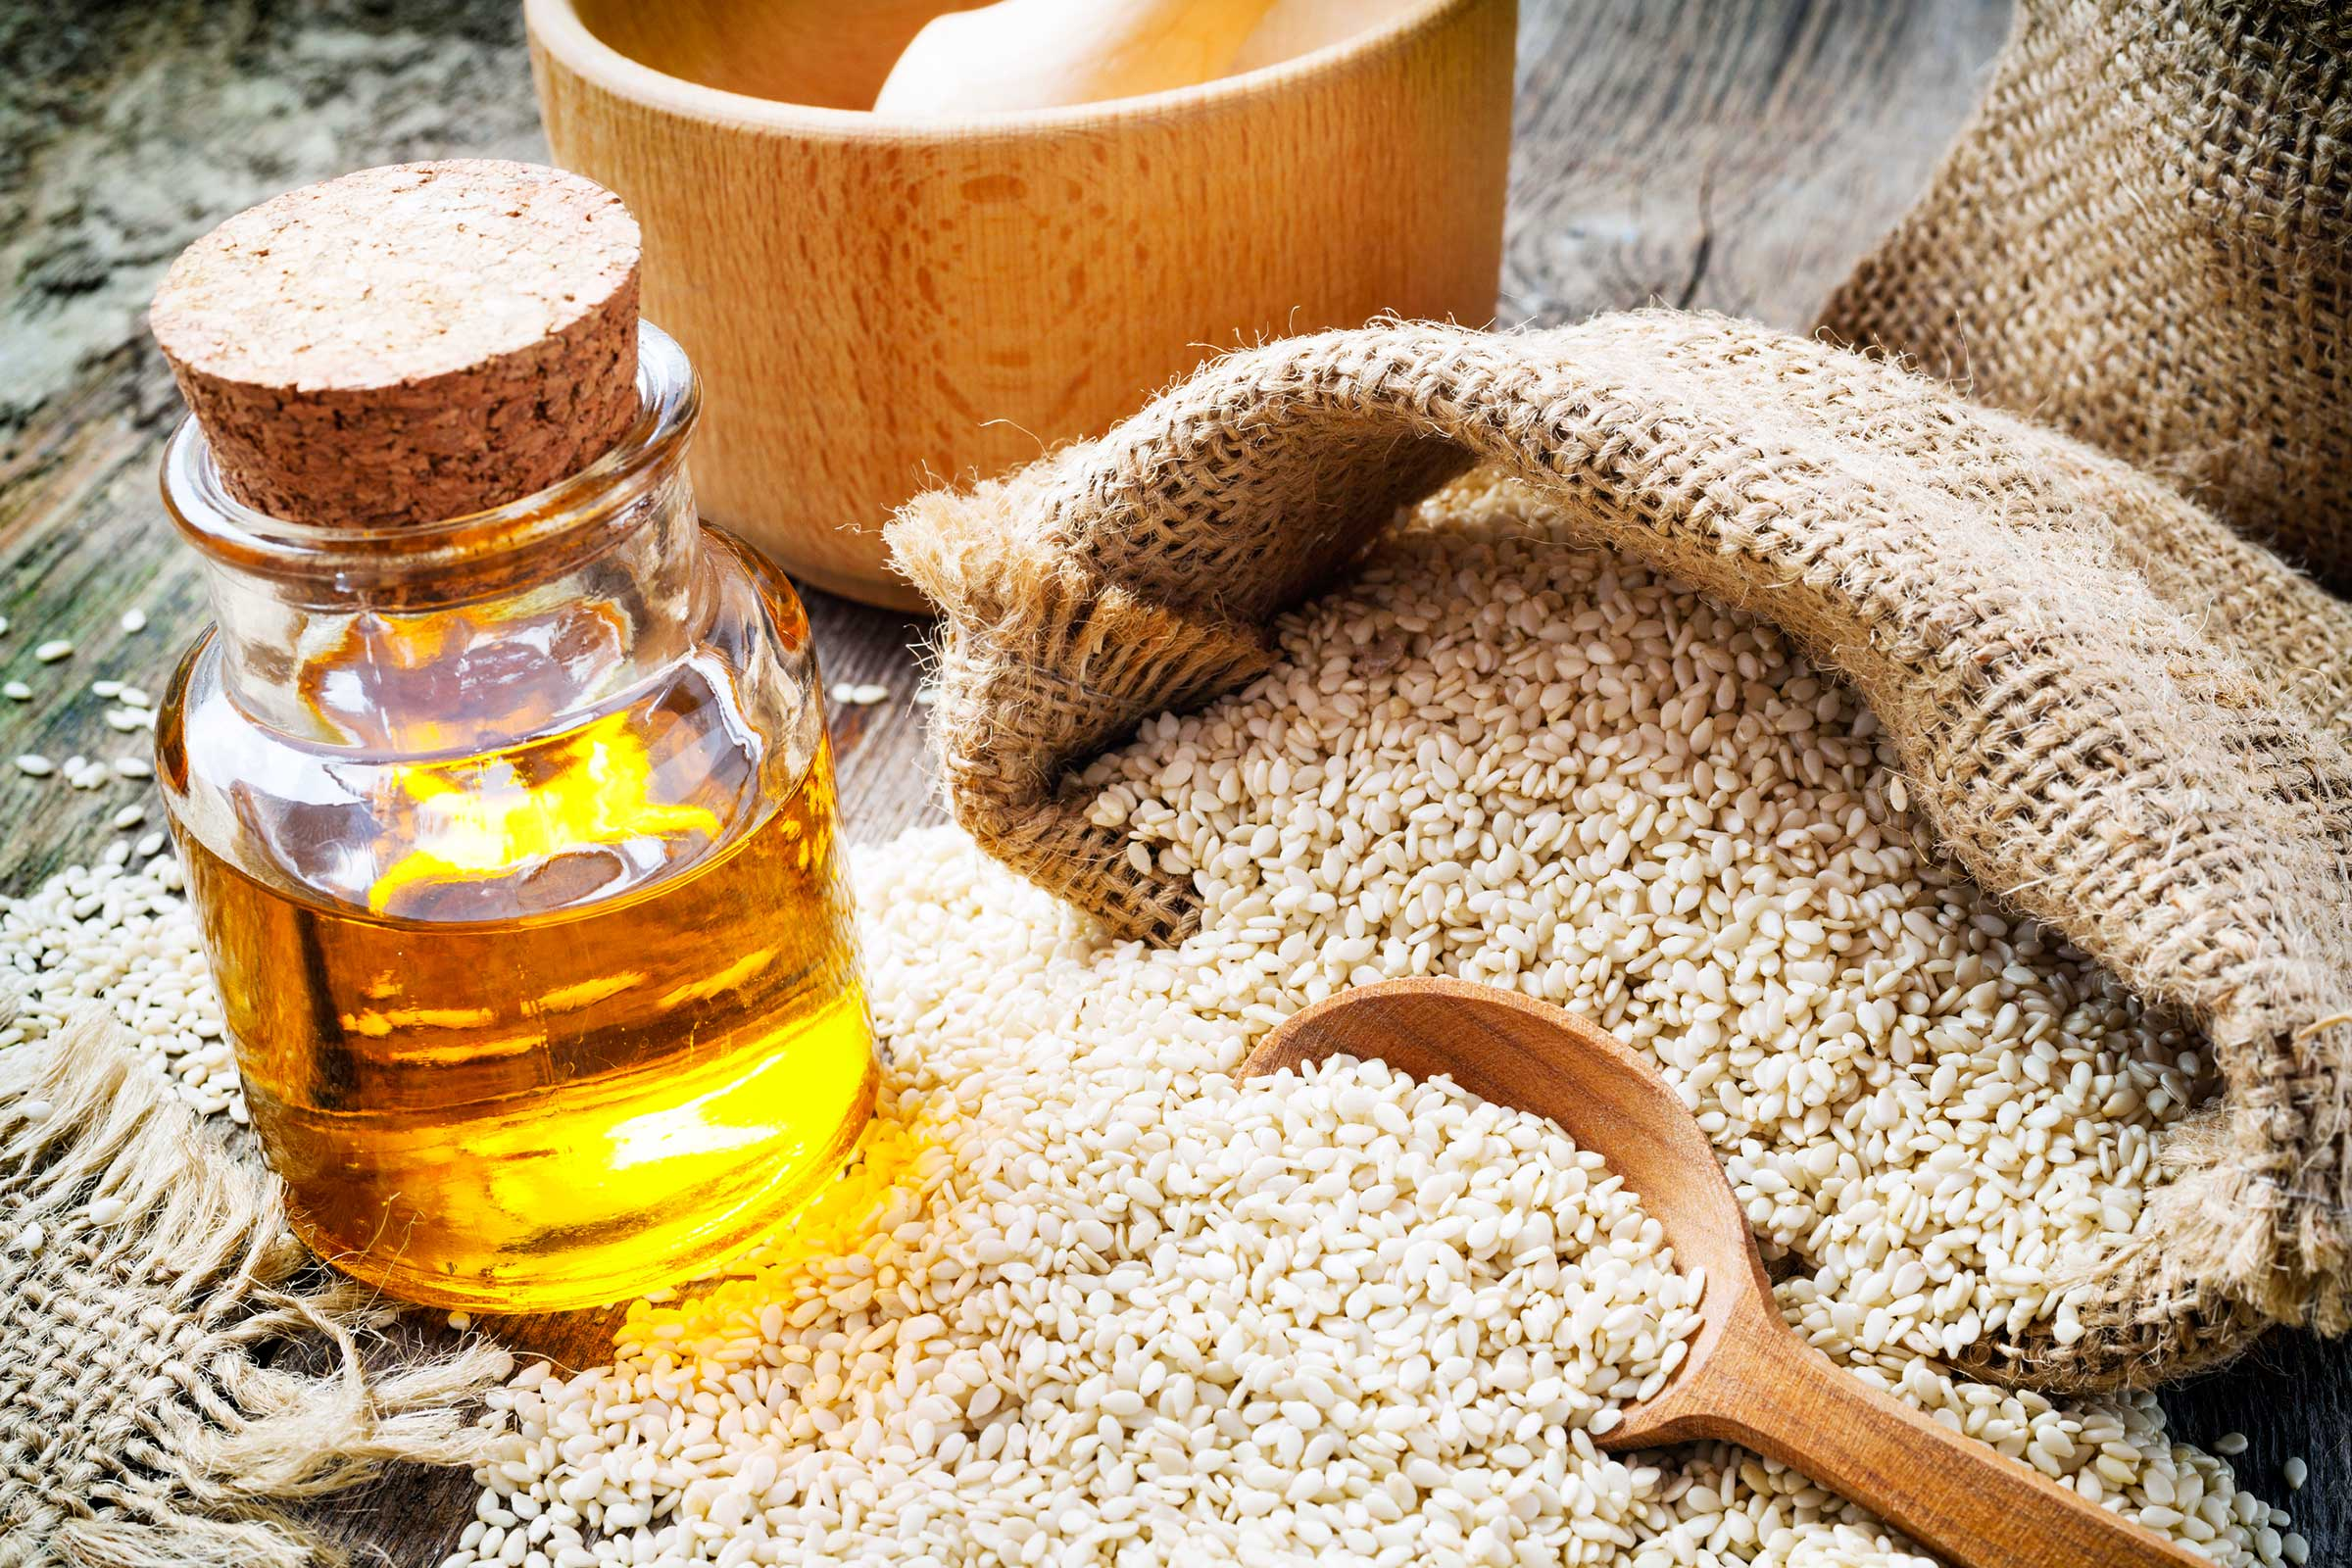 PunjabKesari, Sesame oil Image, Sunscreen Image, सनस्क्रीन लोशन इमेज, Beauty Hindi Tips Image